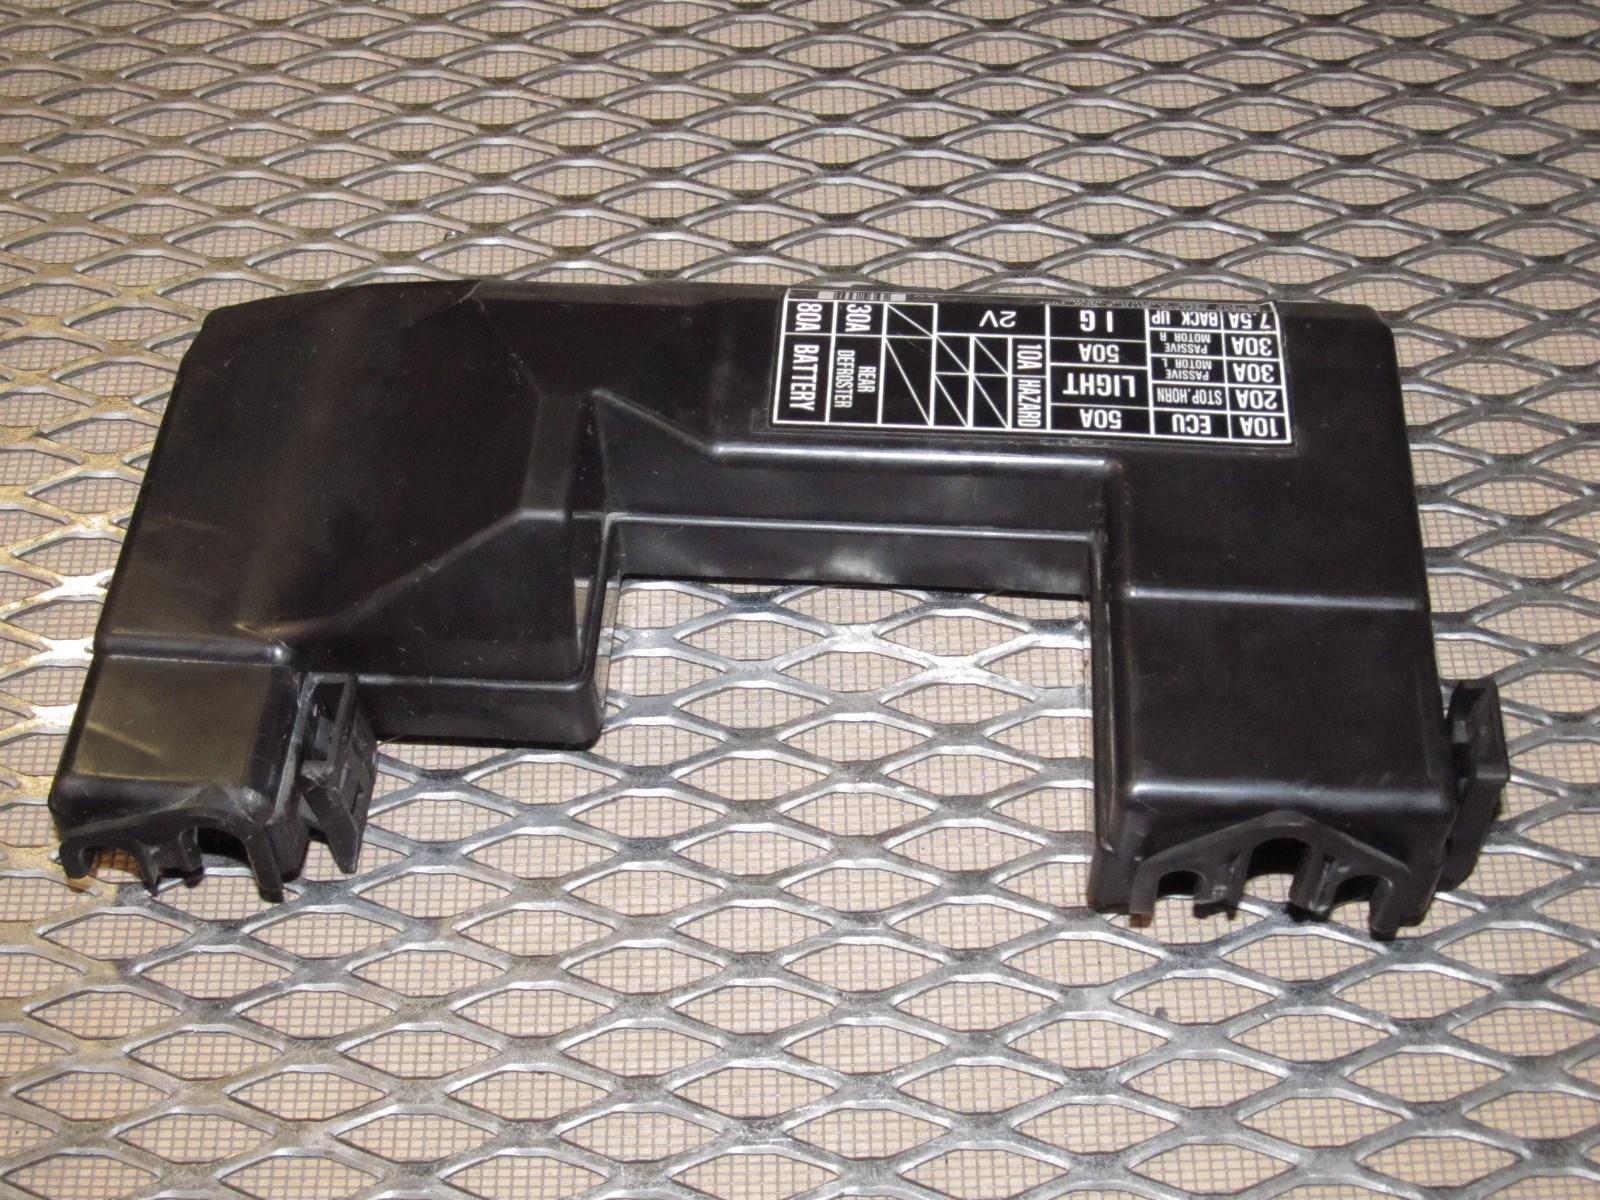 90 91 92 93 acura integra oem engine fuse box cover  [ 1600 x 1200 Pixel ]